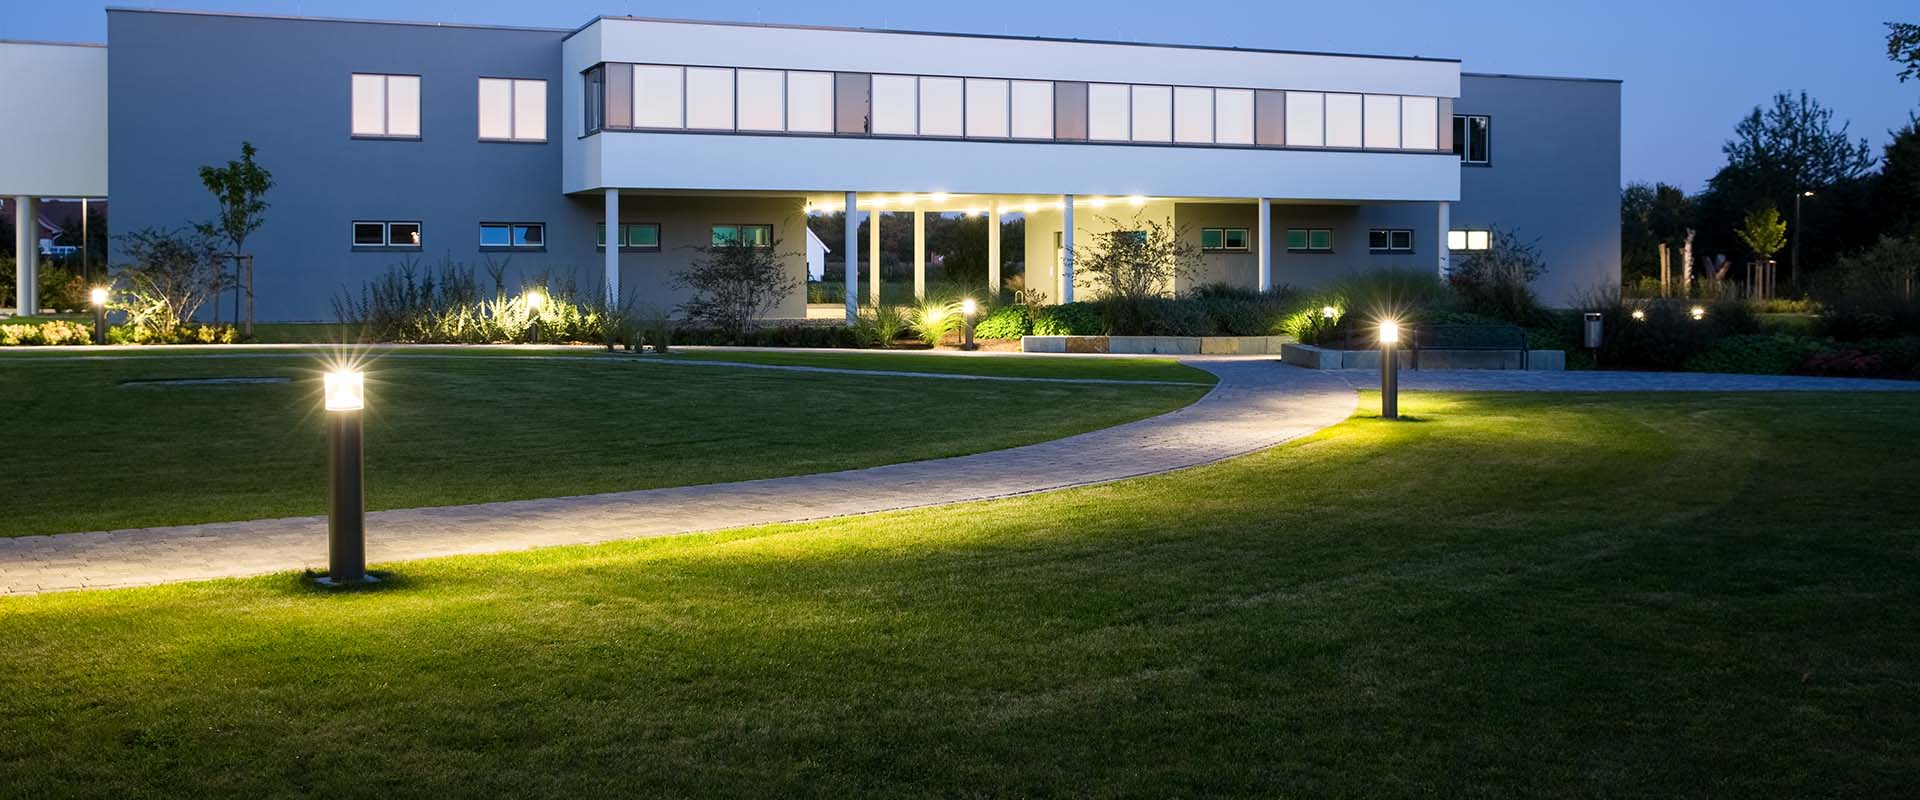 chemins eclairage ext rieur application trilux simplify your light. Black Bedroom Furniture Sets. Home Design Ideas